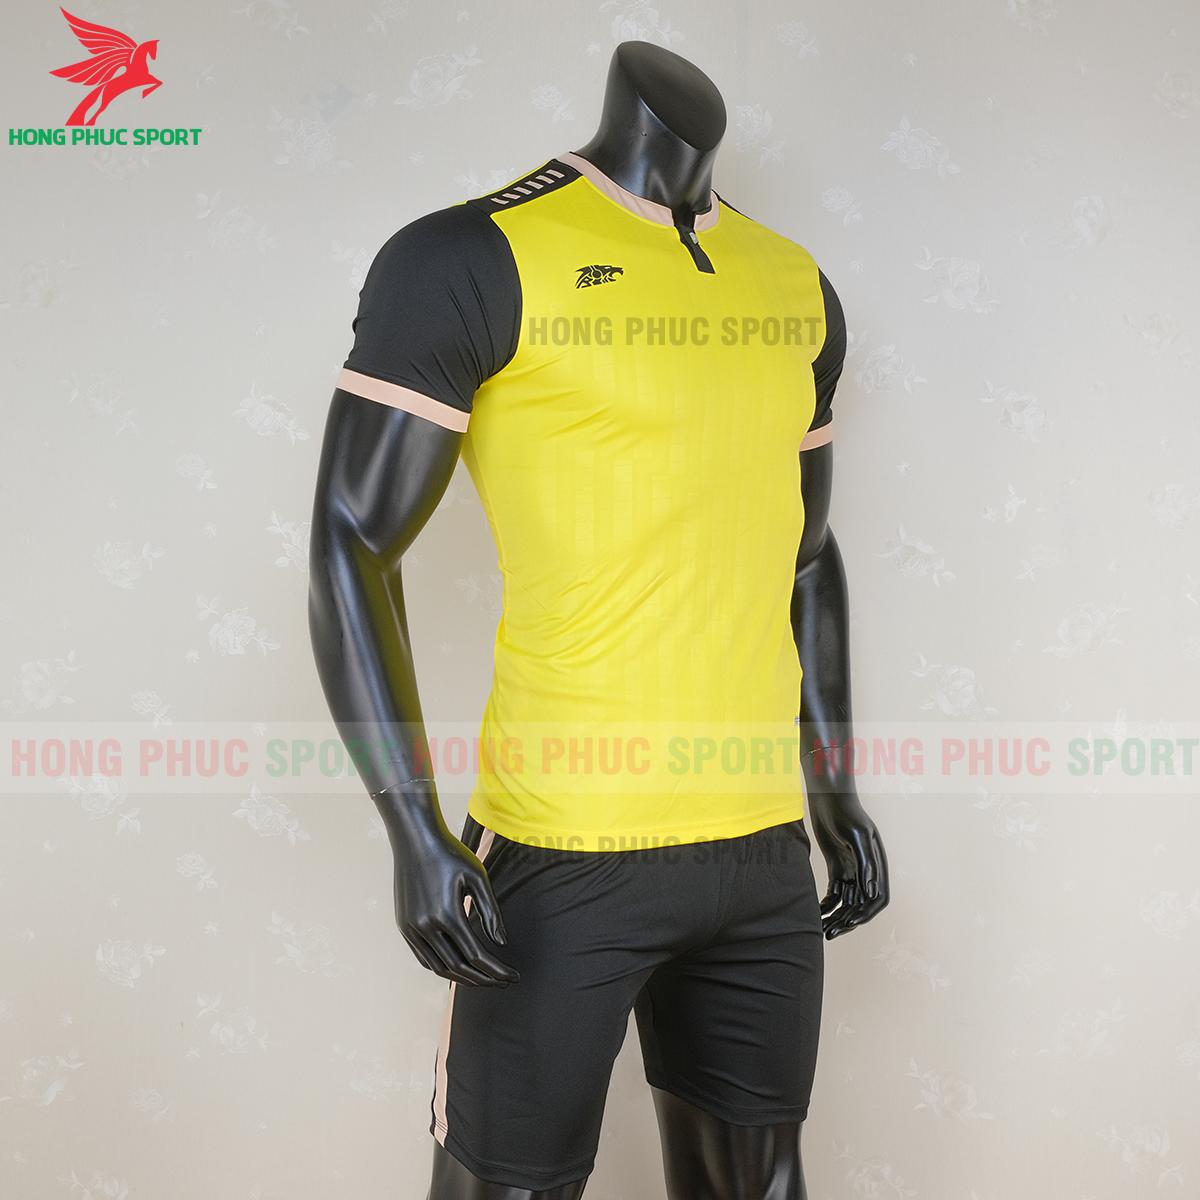 https://cdn.hongphucsport.com/unsafe/s4.shopbay.vn/files/285/ao-bong-da-khong-logo-riki-neck-mau-vang-1-5f71ae054668a.png